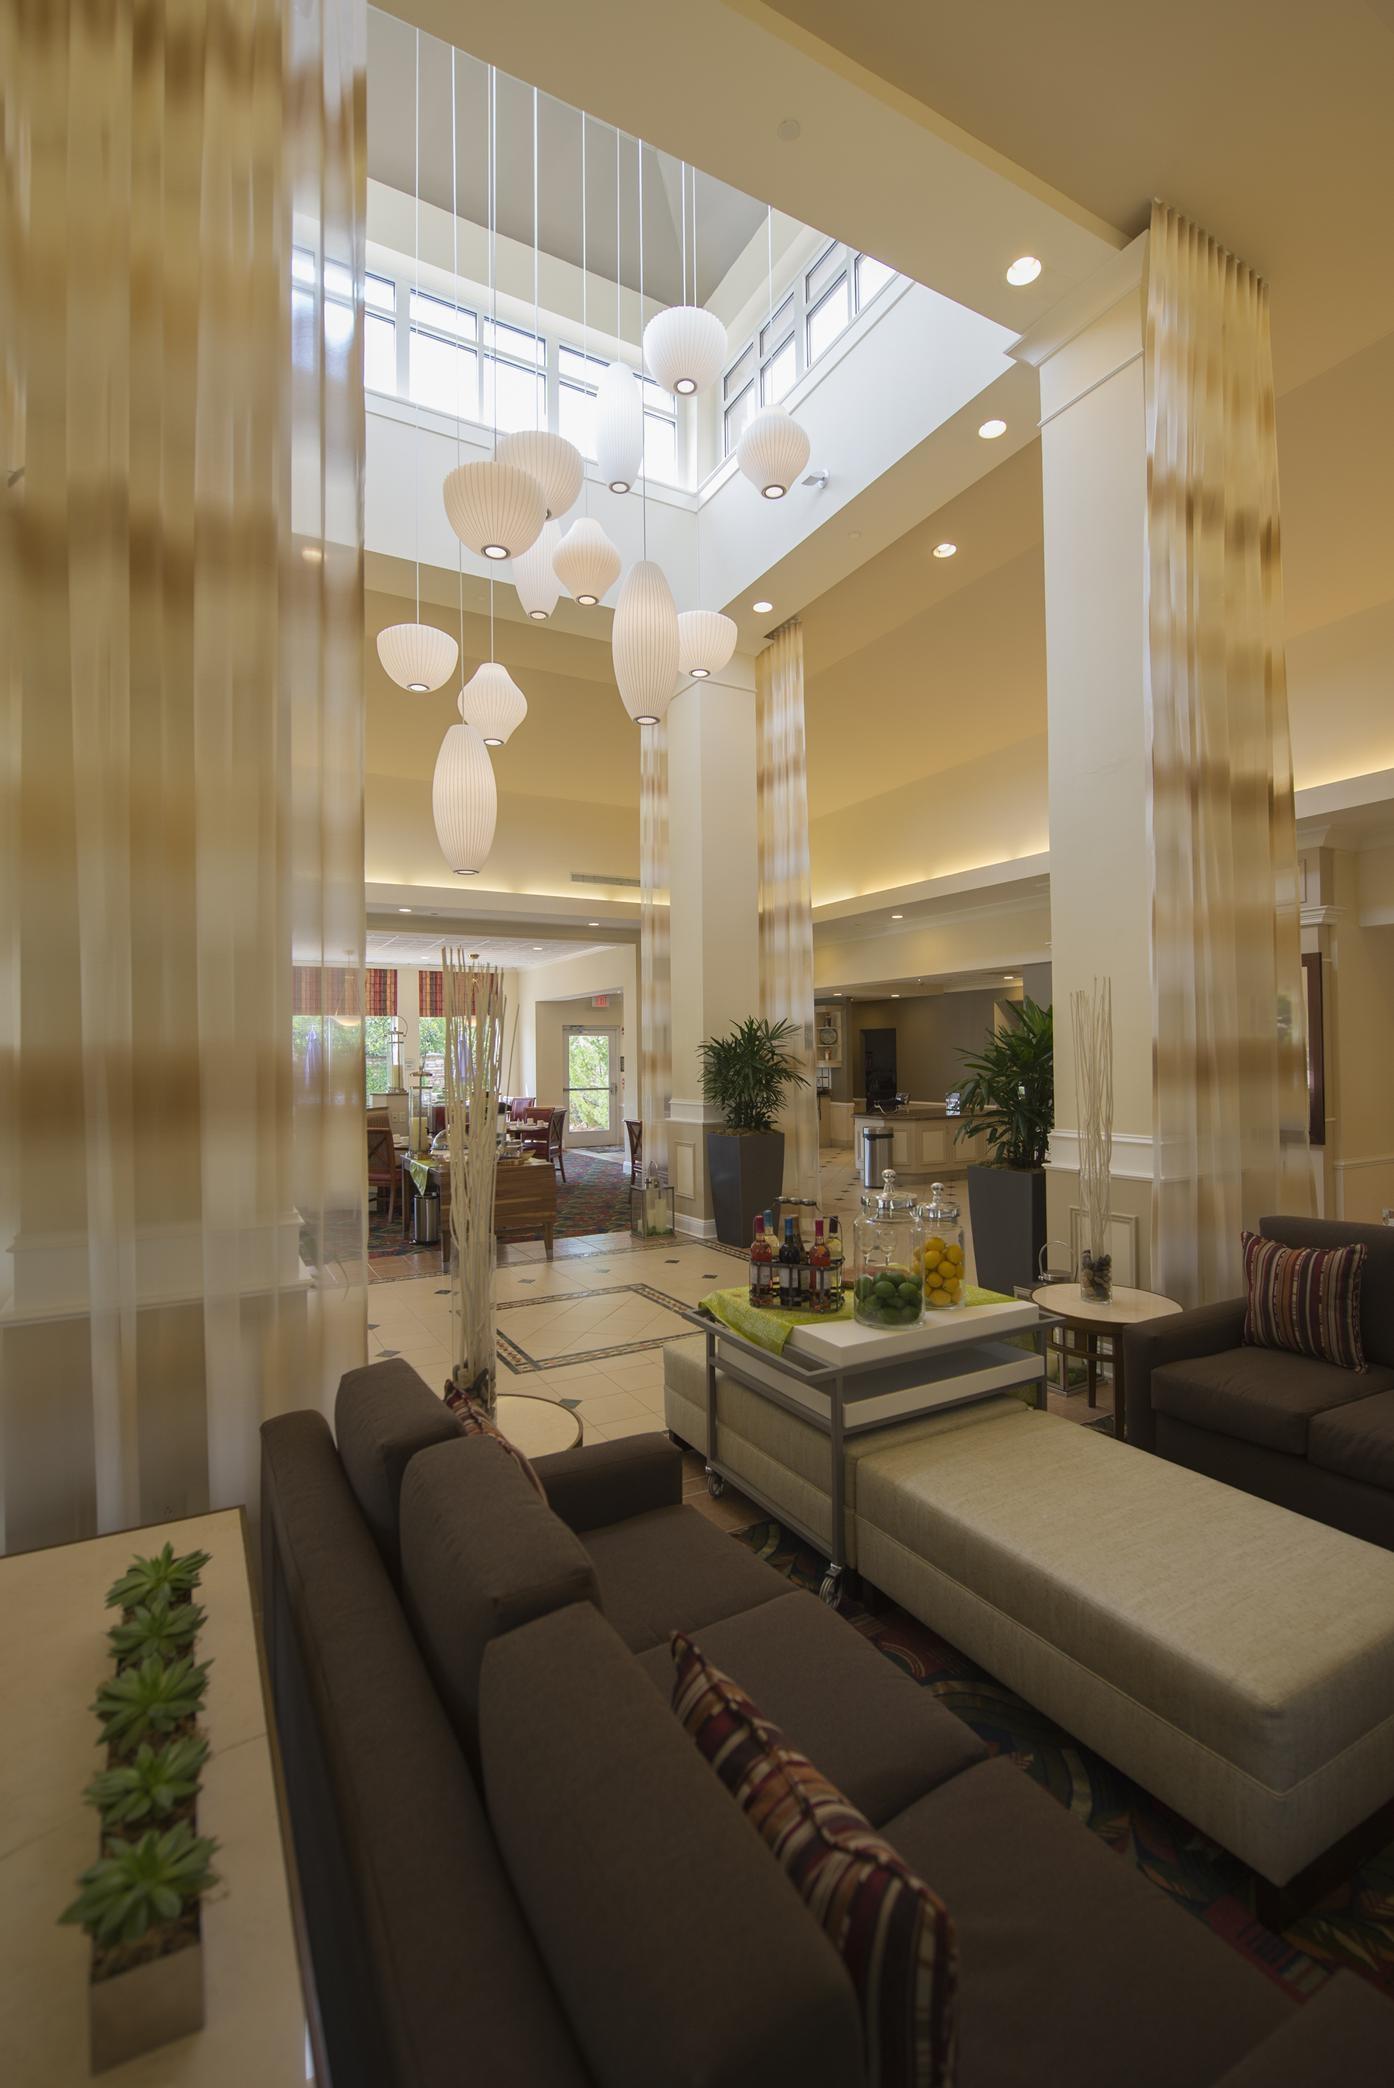 Hilton Garden Inn Jackson/Madison 320 New Mannsdale Road Madison, MS .